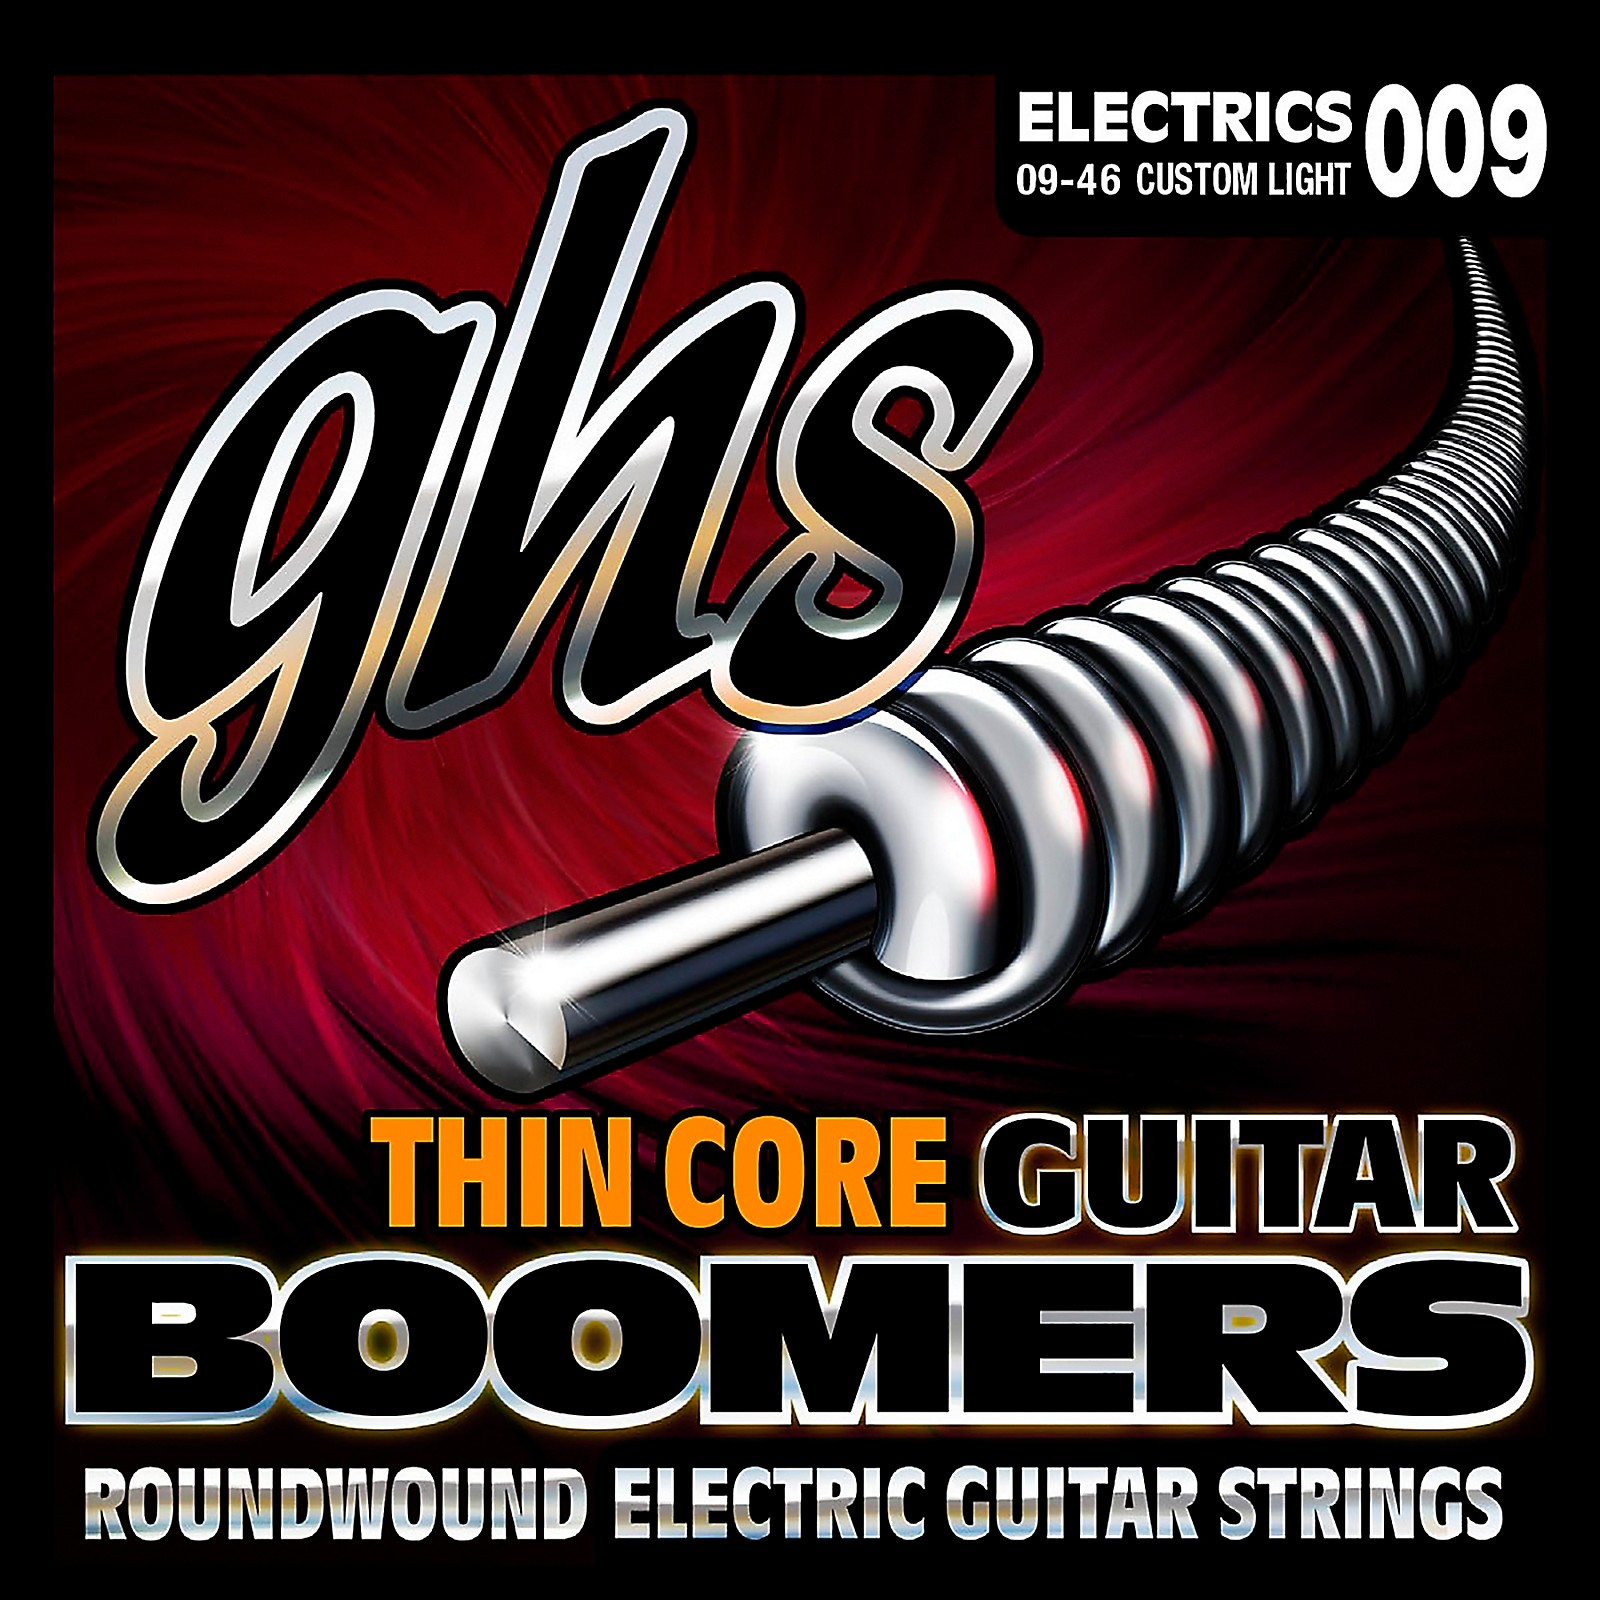 GHS TC-GBCL Thin Core Boomers Custom Light Electric Guitar Strings (9-46)